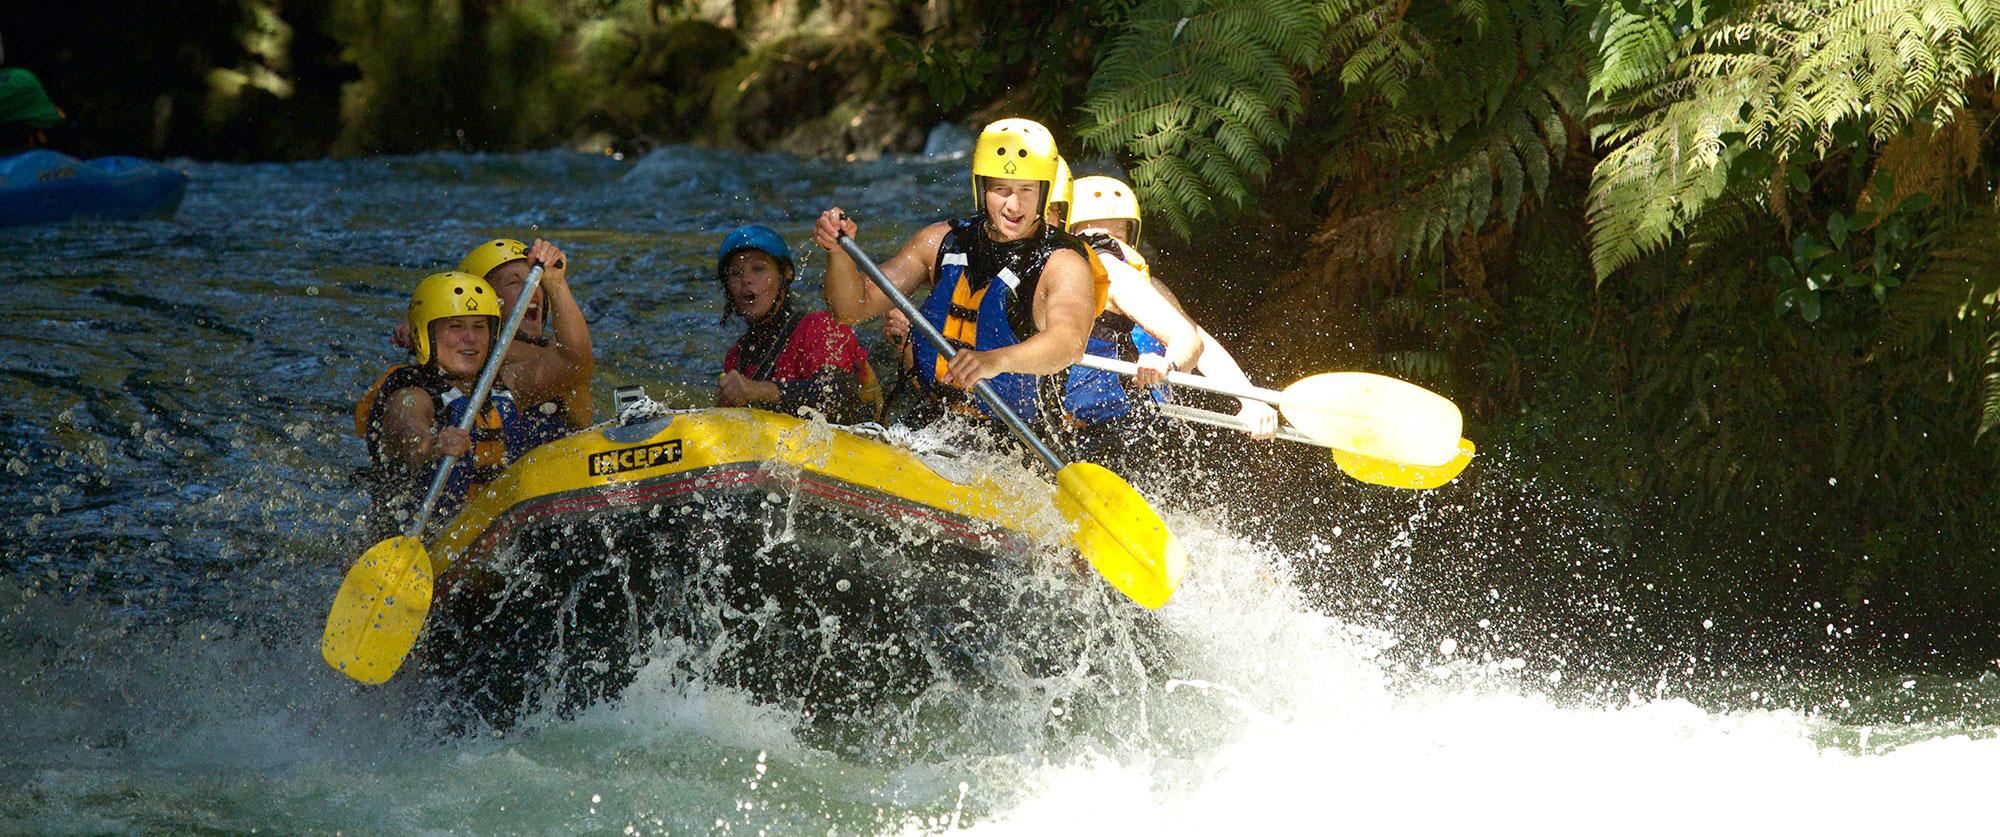 New Zealand Honeymoon Package: Outdoor Adventure - Rotorua Rafting